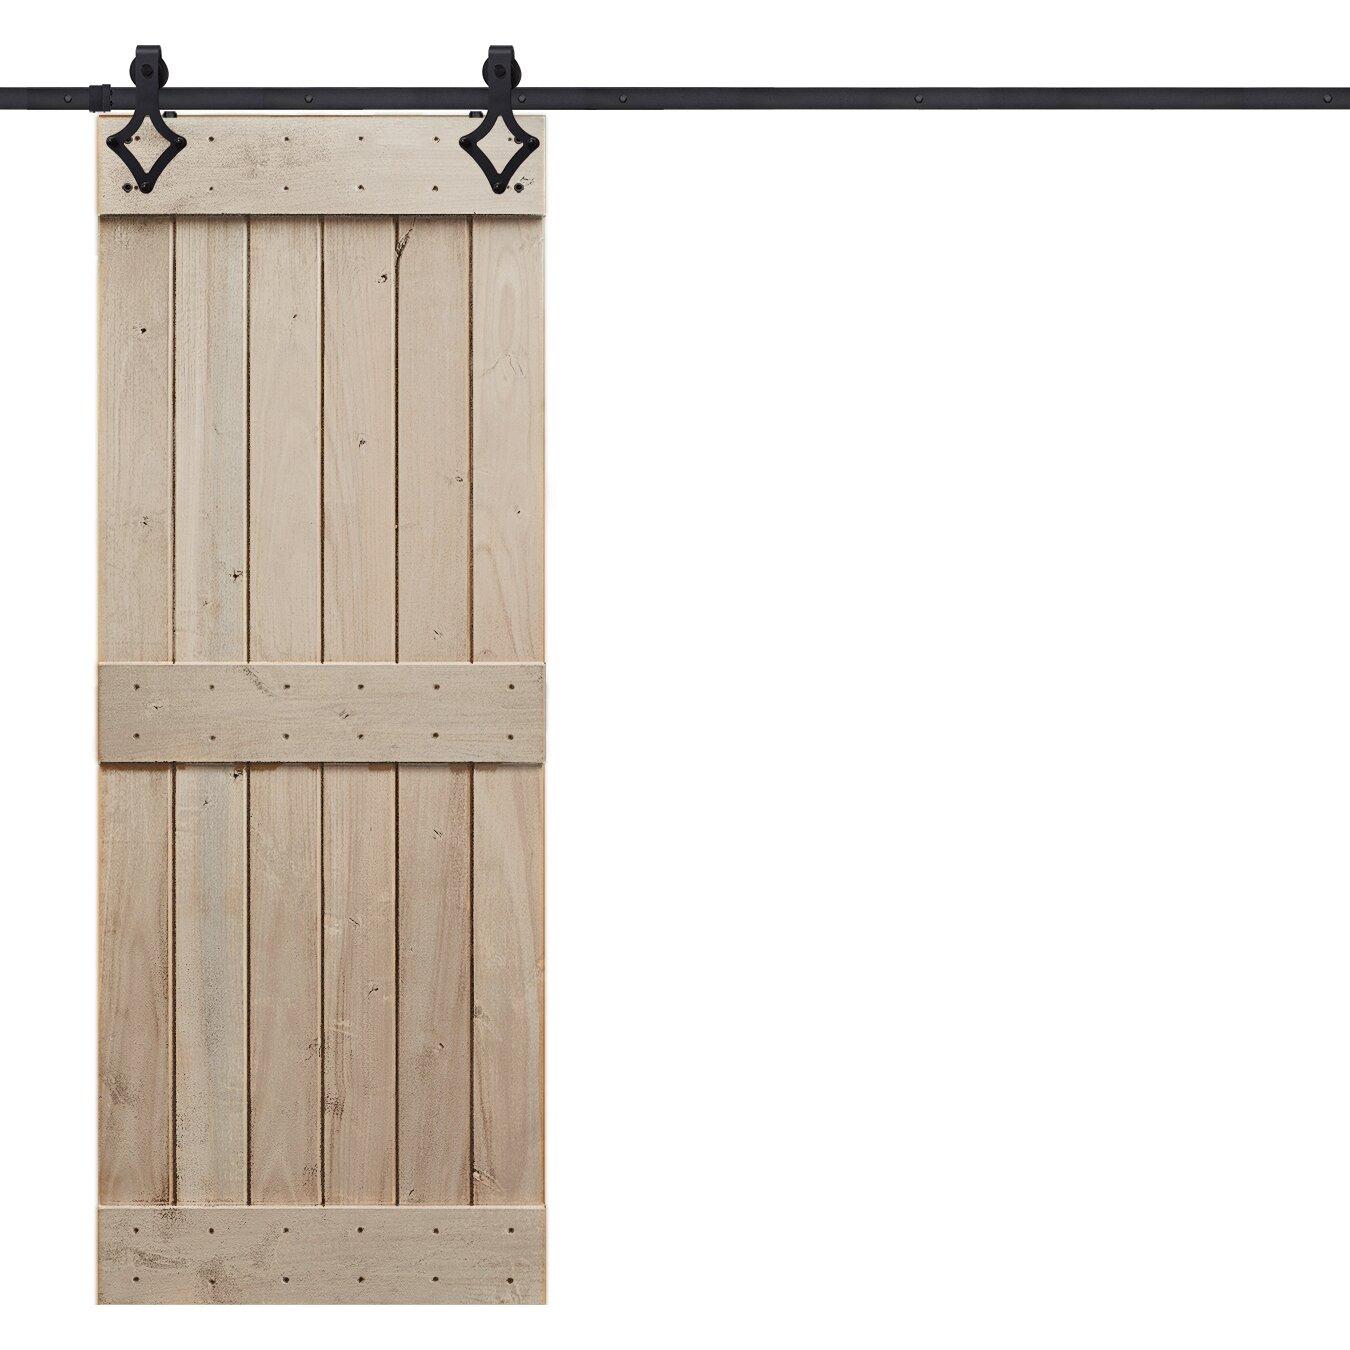 Barndoorz Rustic Knotty Alder Mid Rail Plank Wood Interior Barn Door